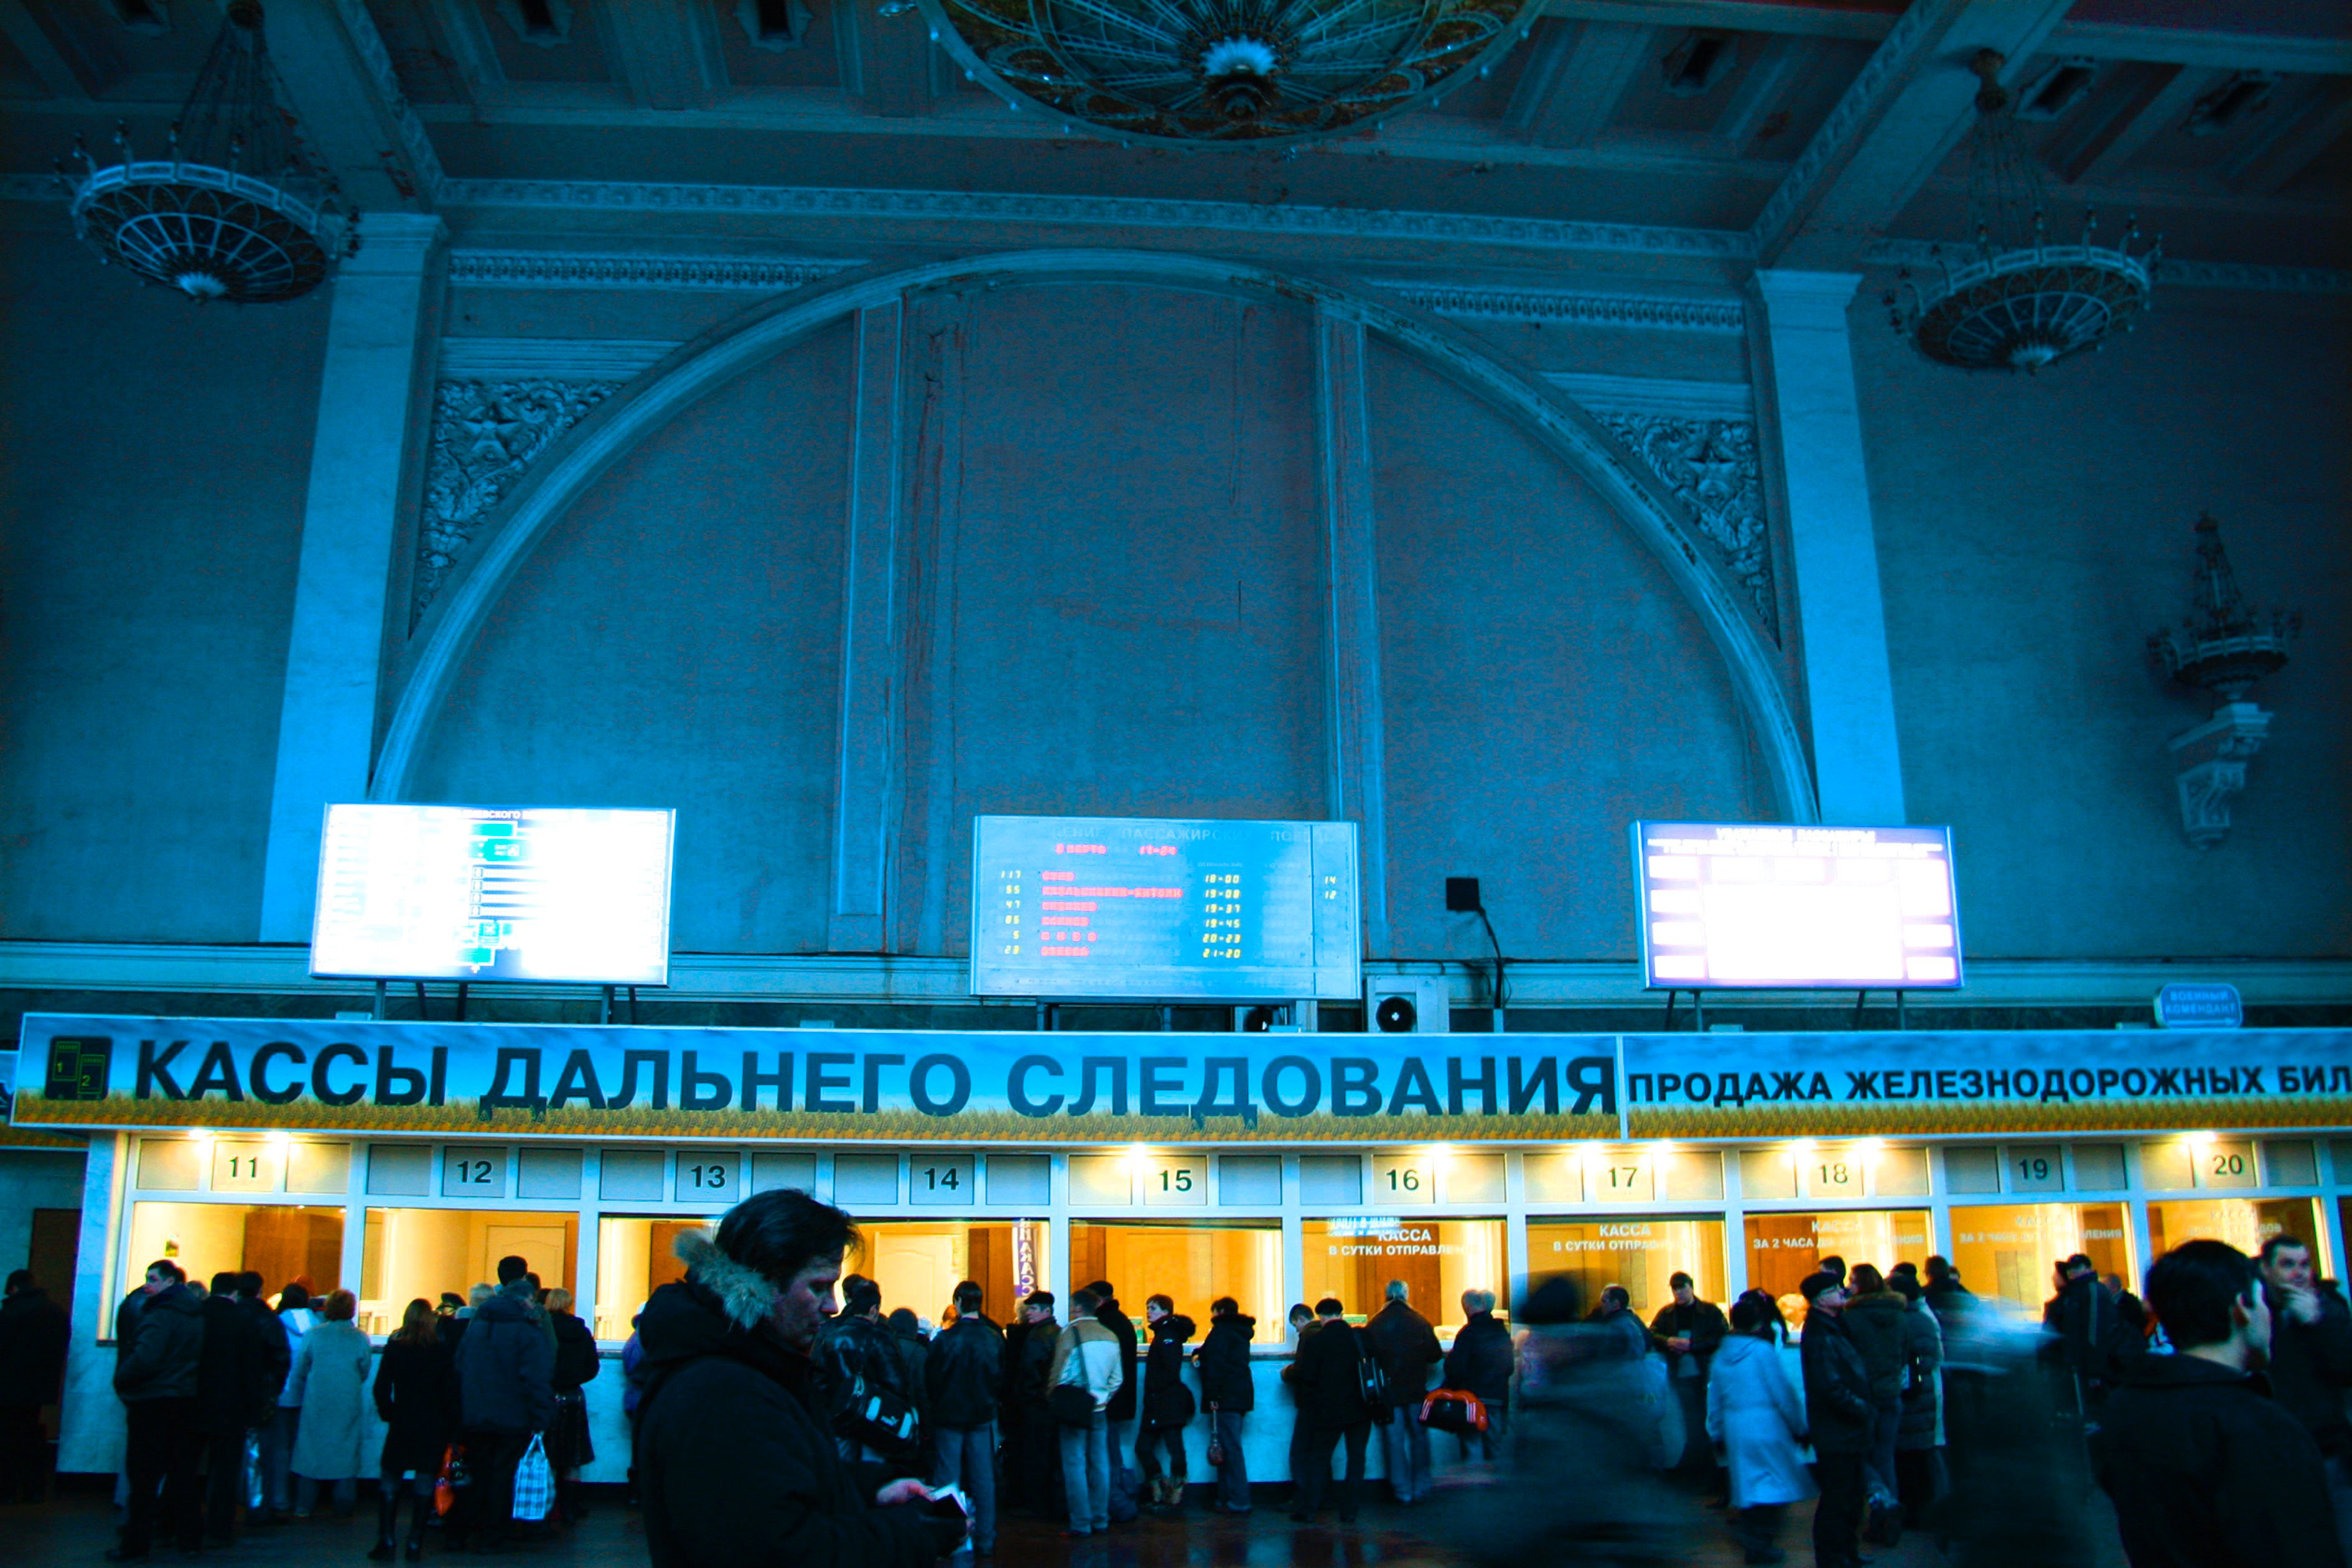 <p>Фото &copy; РИА Новости/Владимир Вяткин</p>